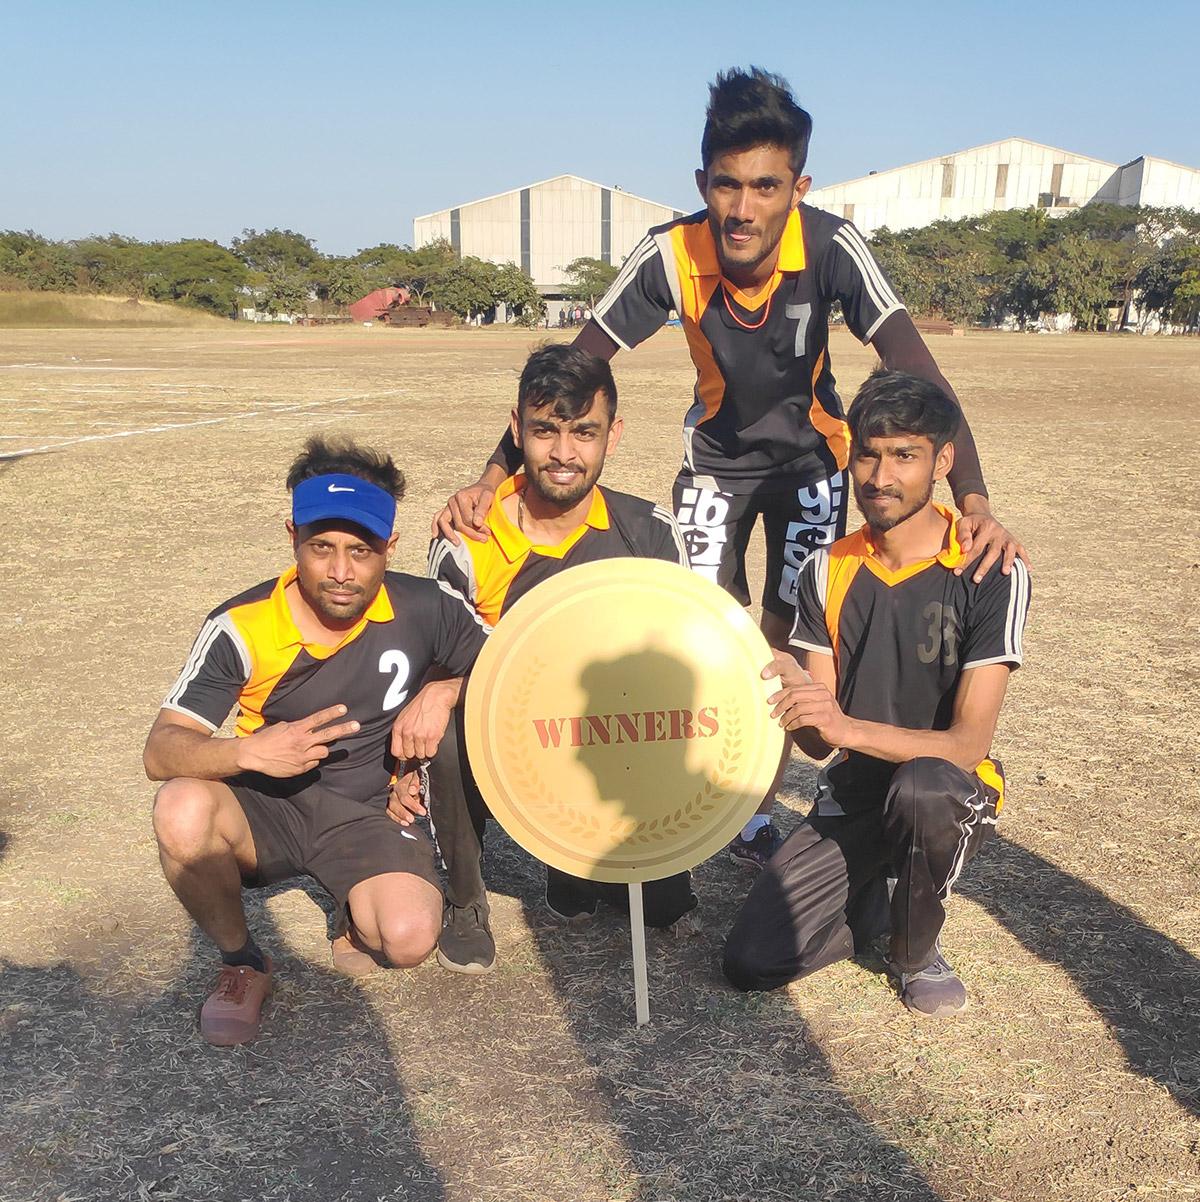 Jyoti Sports Carnival 2020